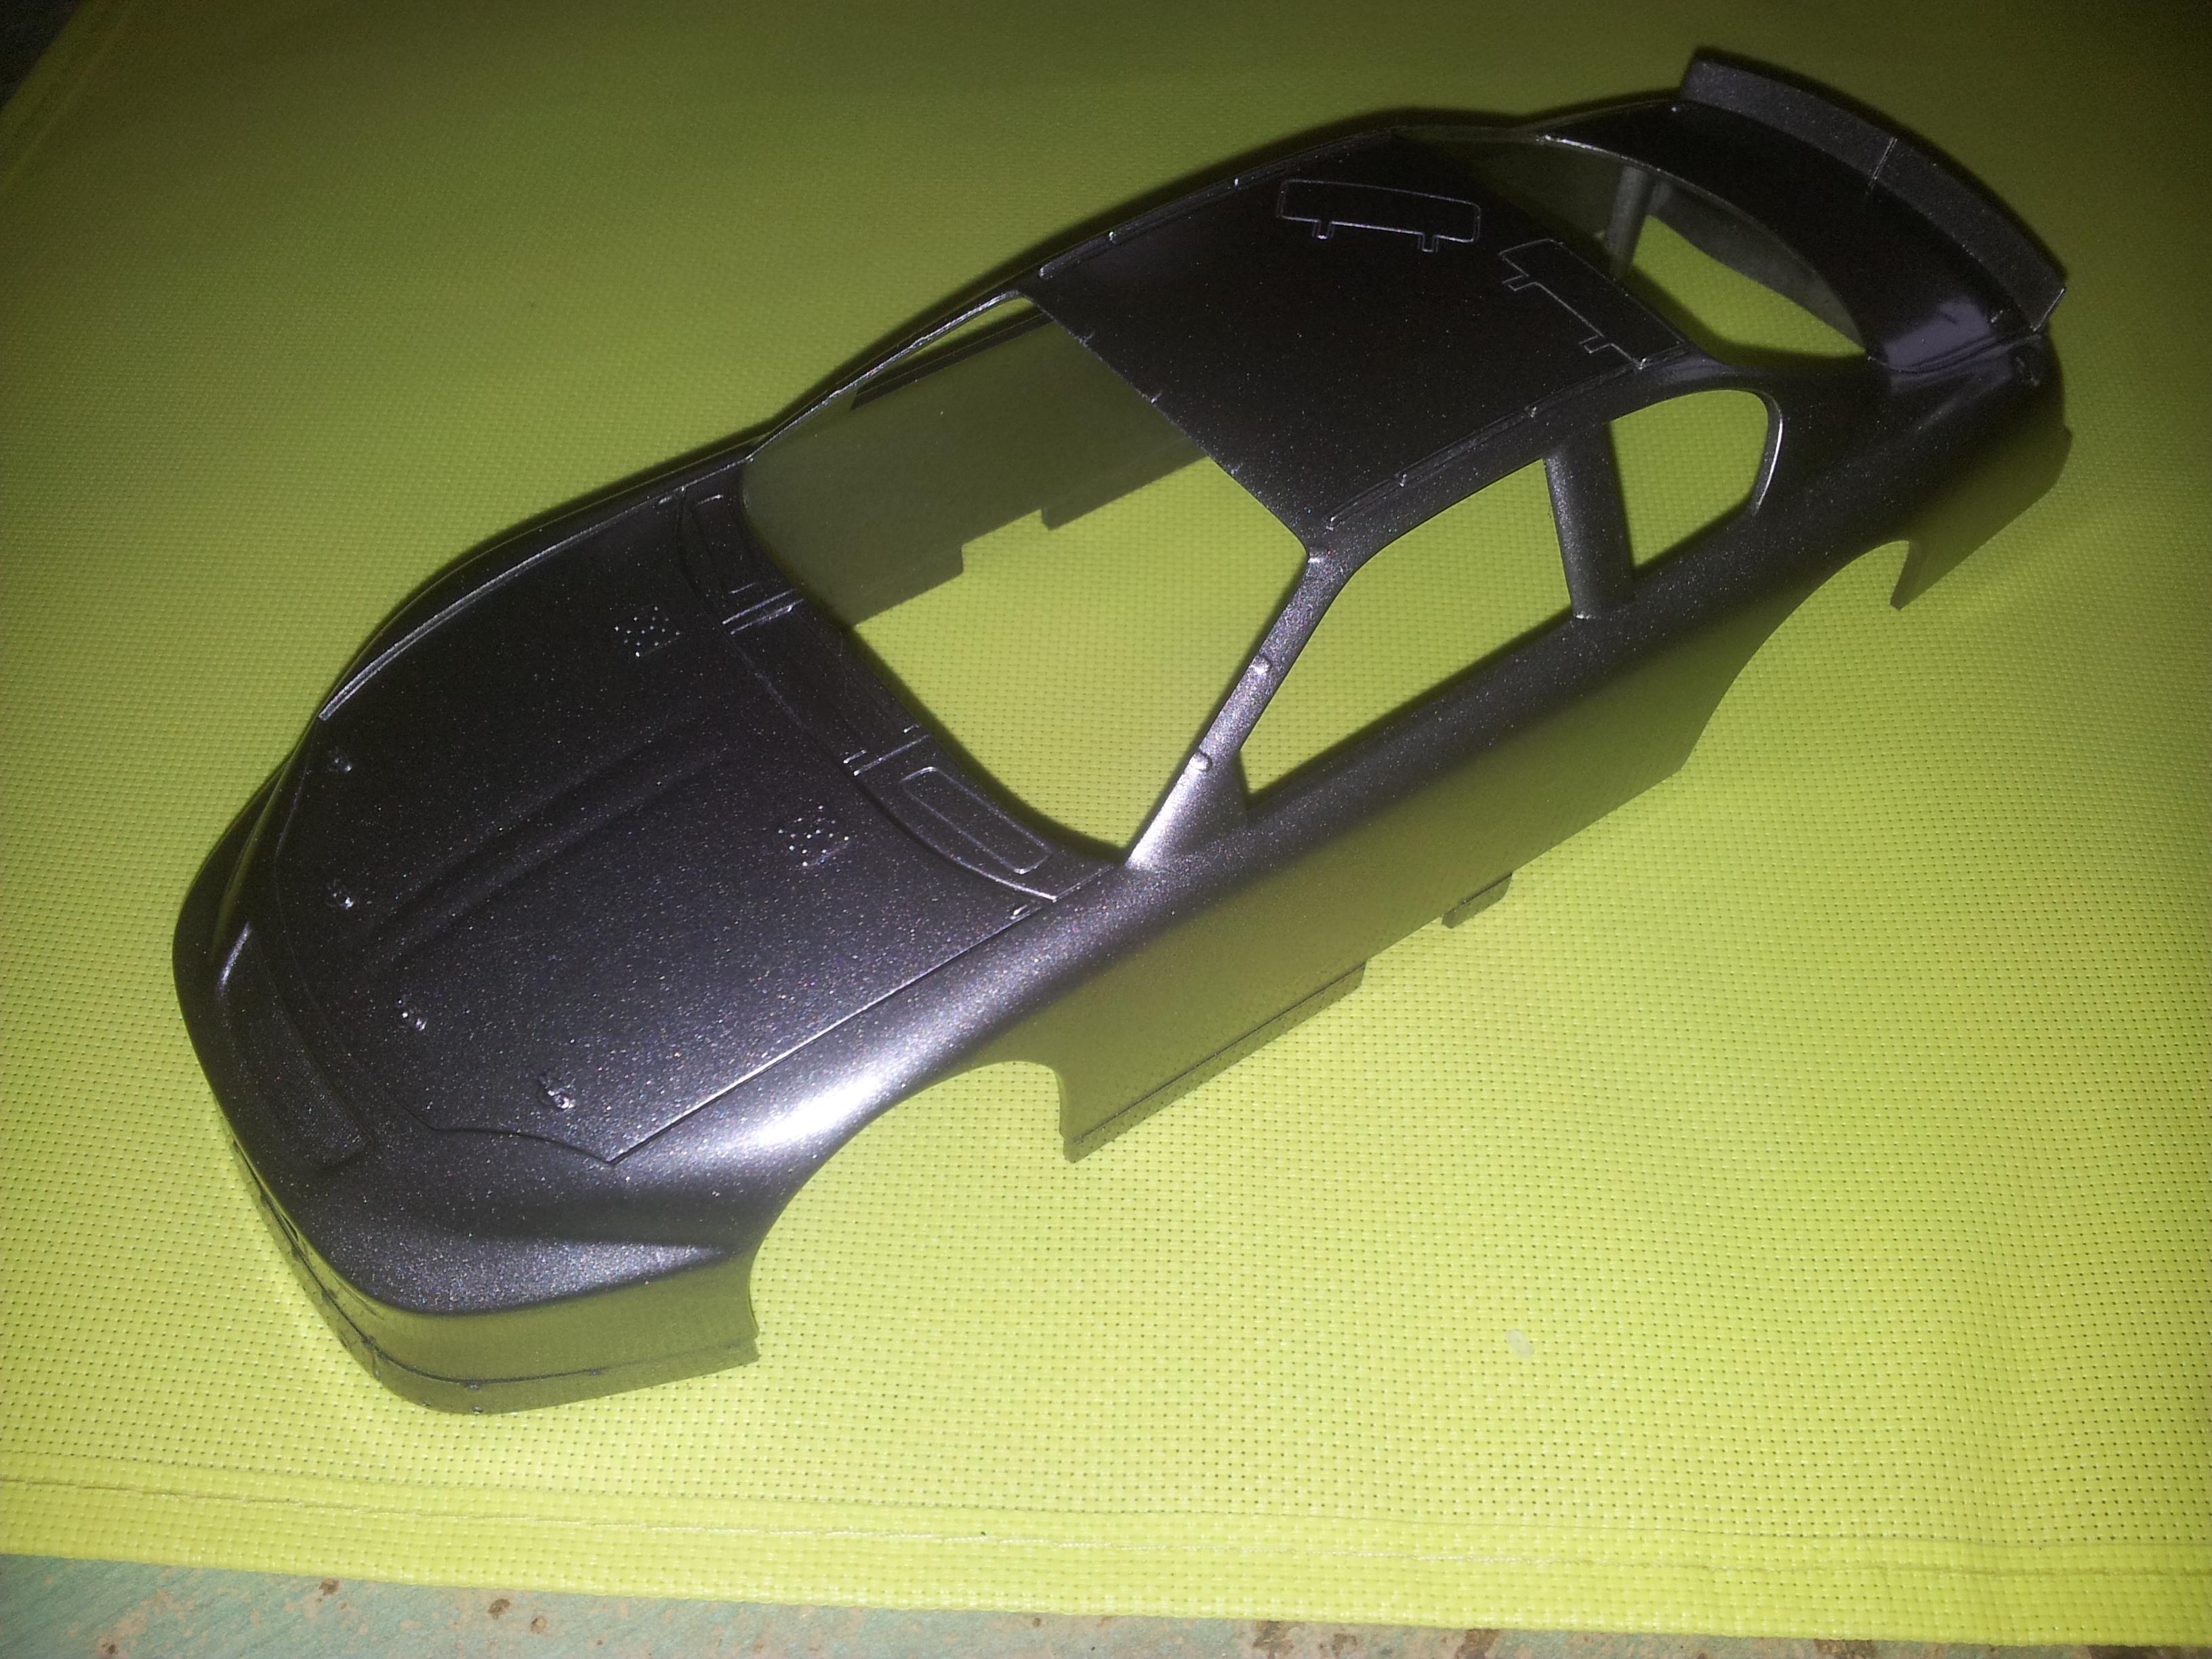 Chevy Monte-Carlo 2003-05 Lowe's #48 J. Jhonson 88666420150131153219